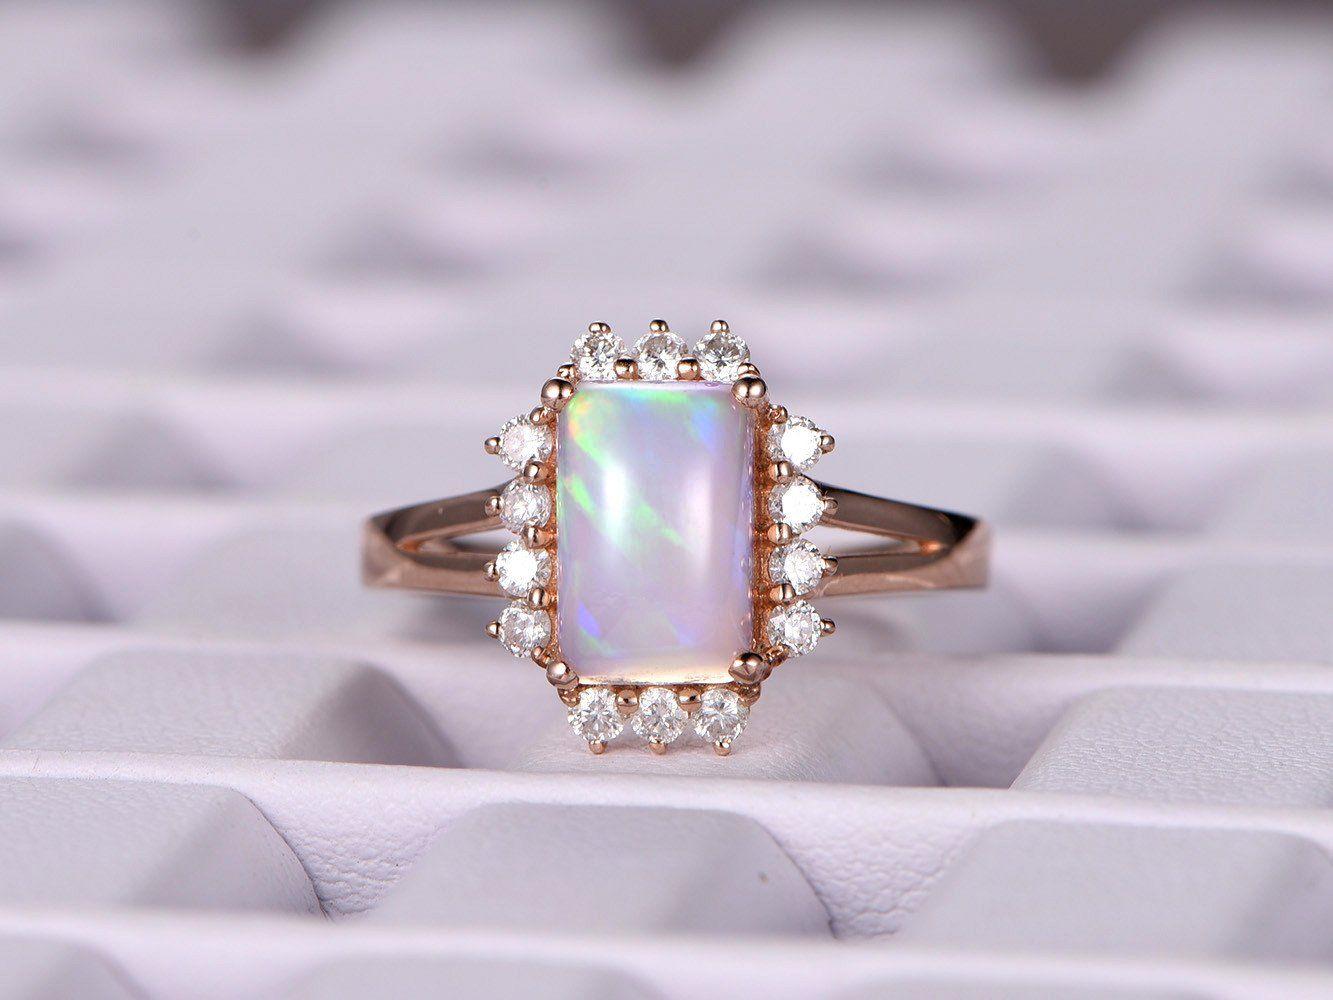 Emerald Cut Africa Opal Engagement Ring VS Diamond Wedding 14K Rose Gold 7x9mm - 4.25 / 14K White Gold